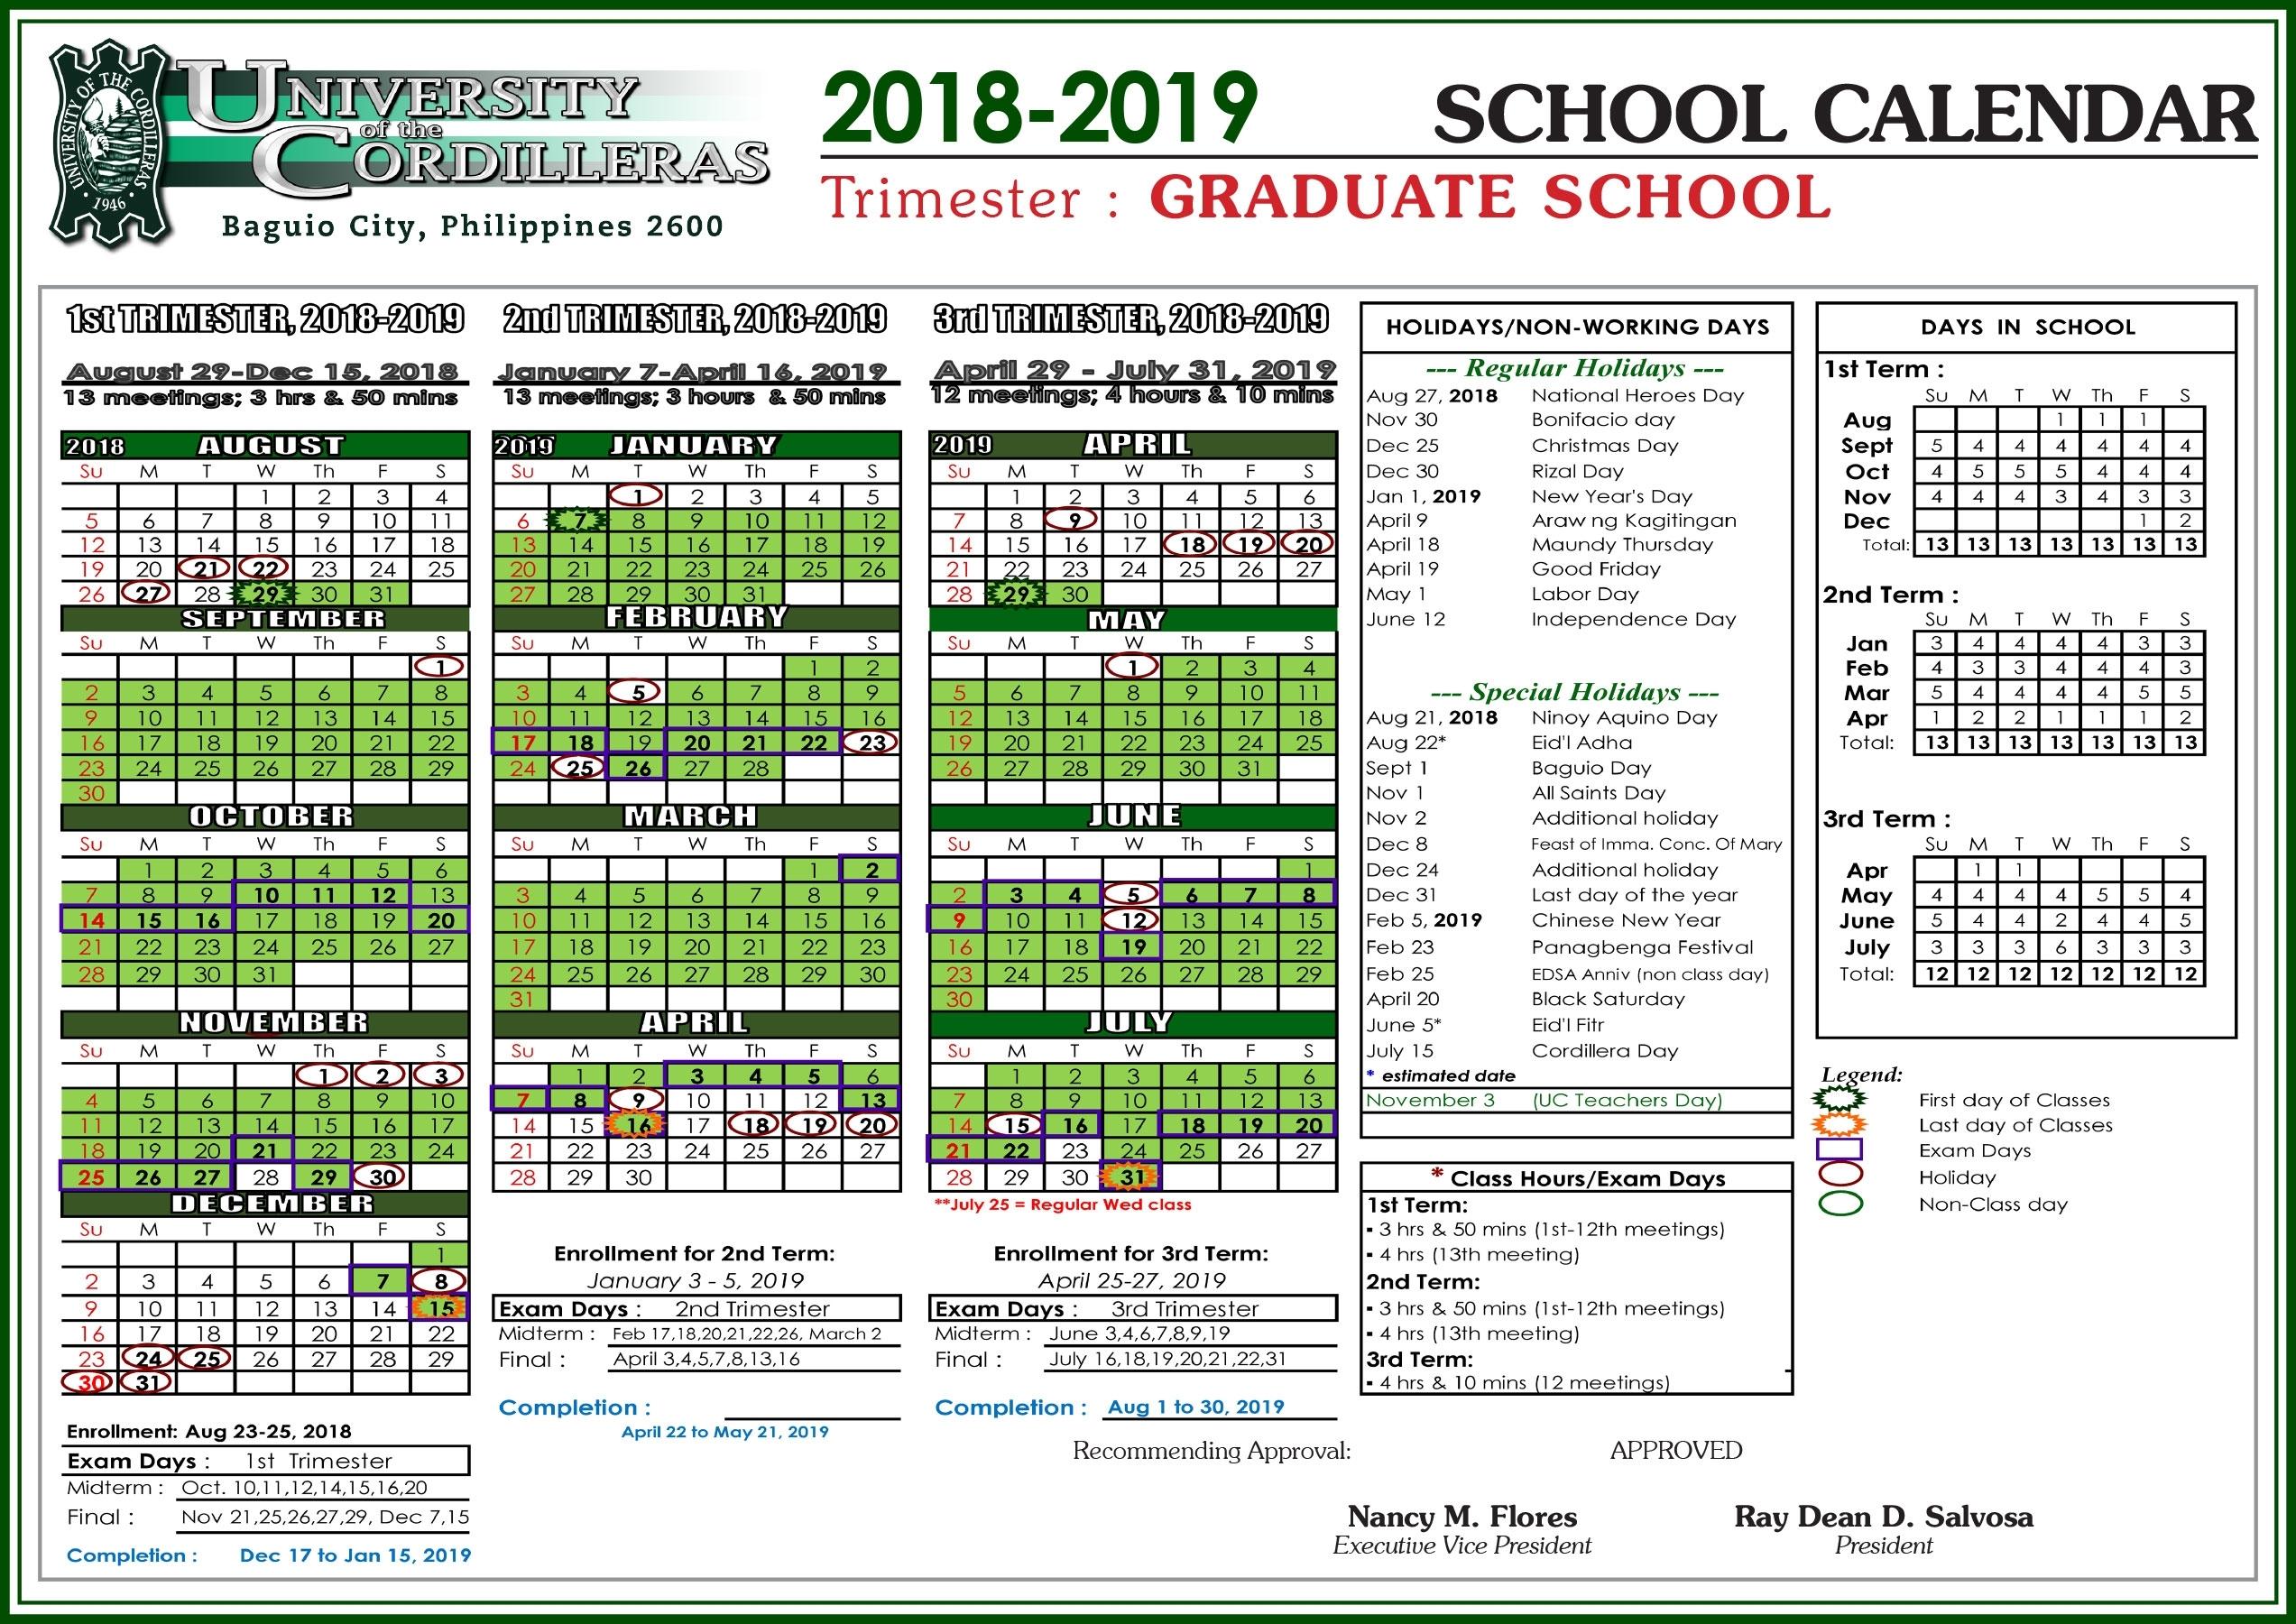 Uc School Calendar For Sy 2018-2019 - University Of The Cordilleras